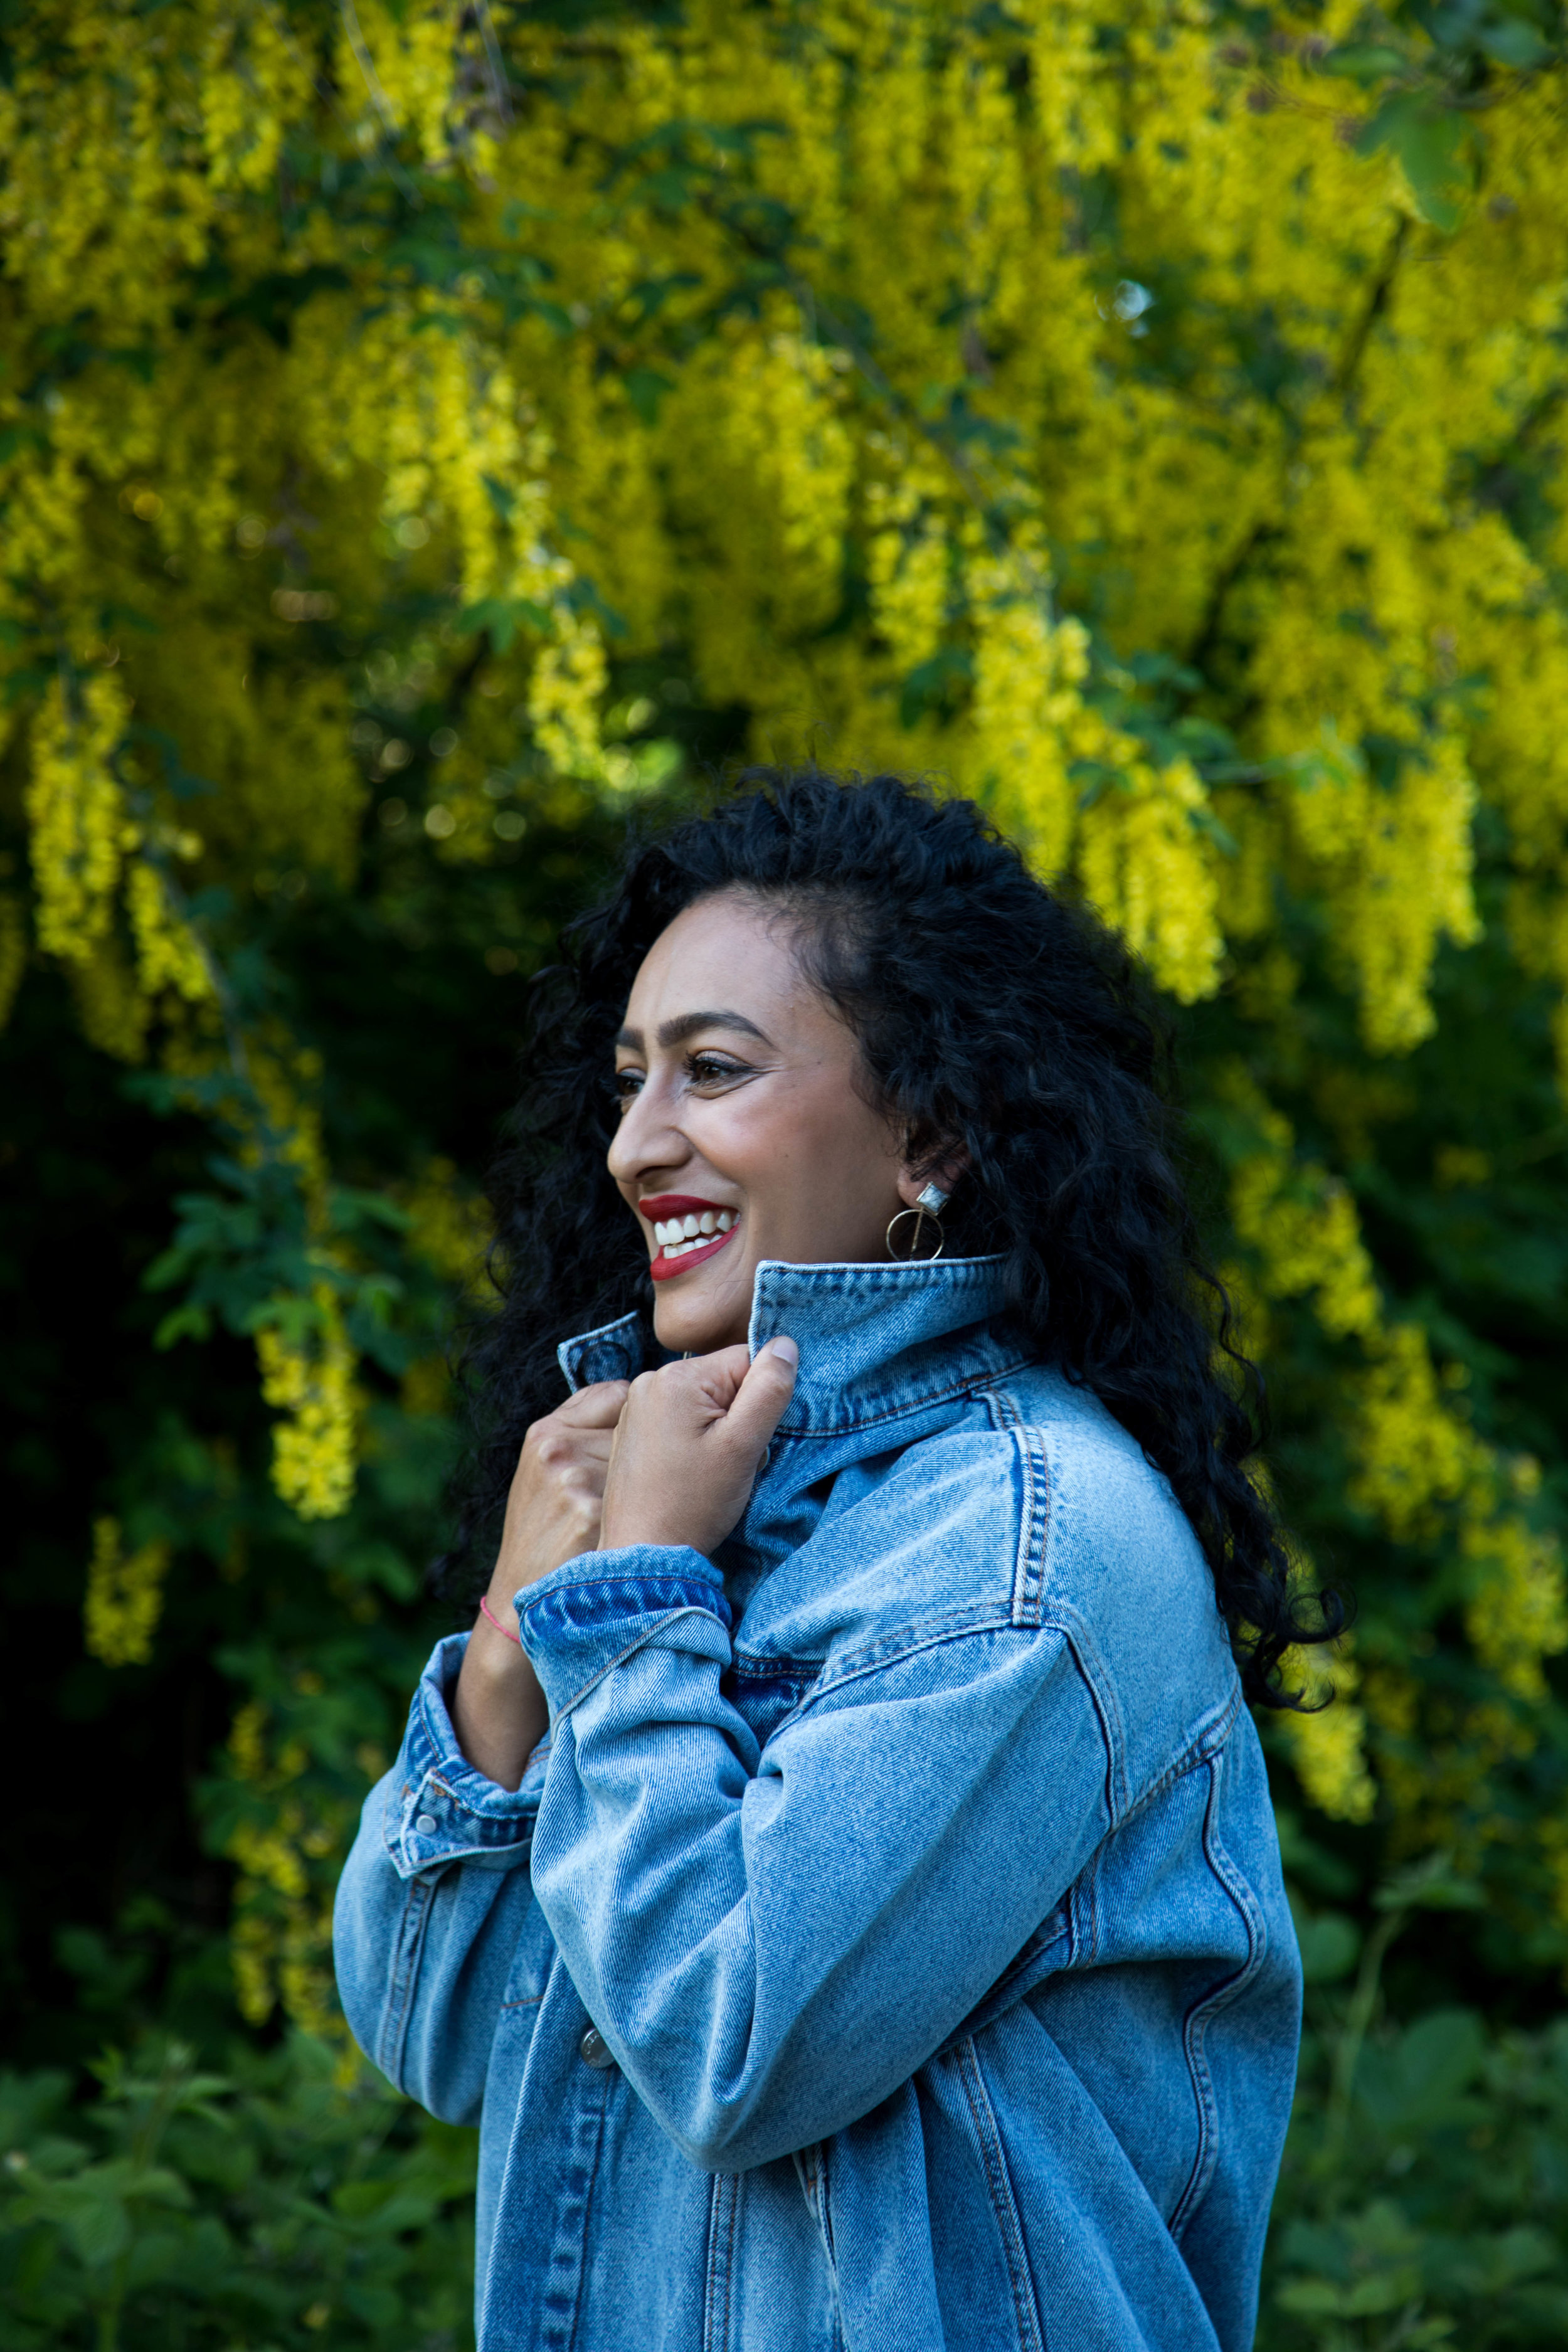 yellow bush laughing.jpg